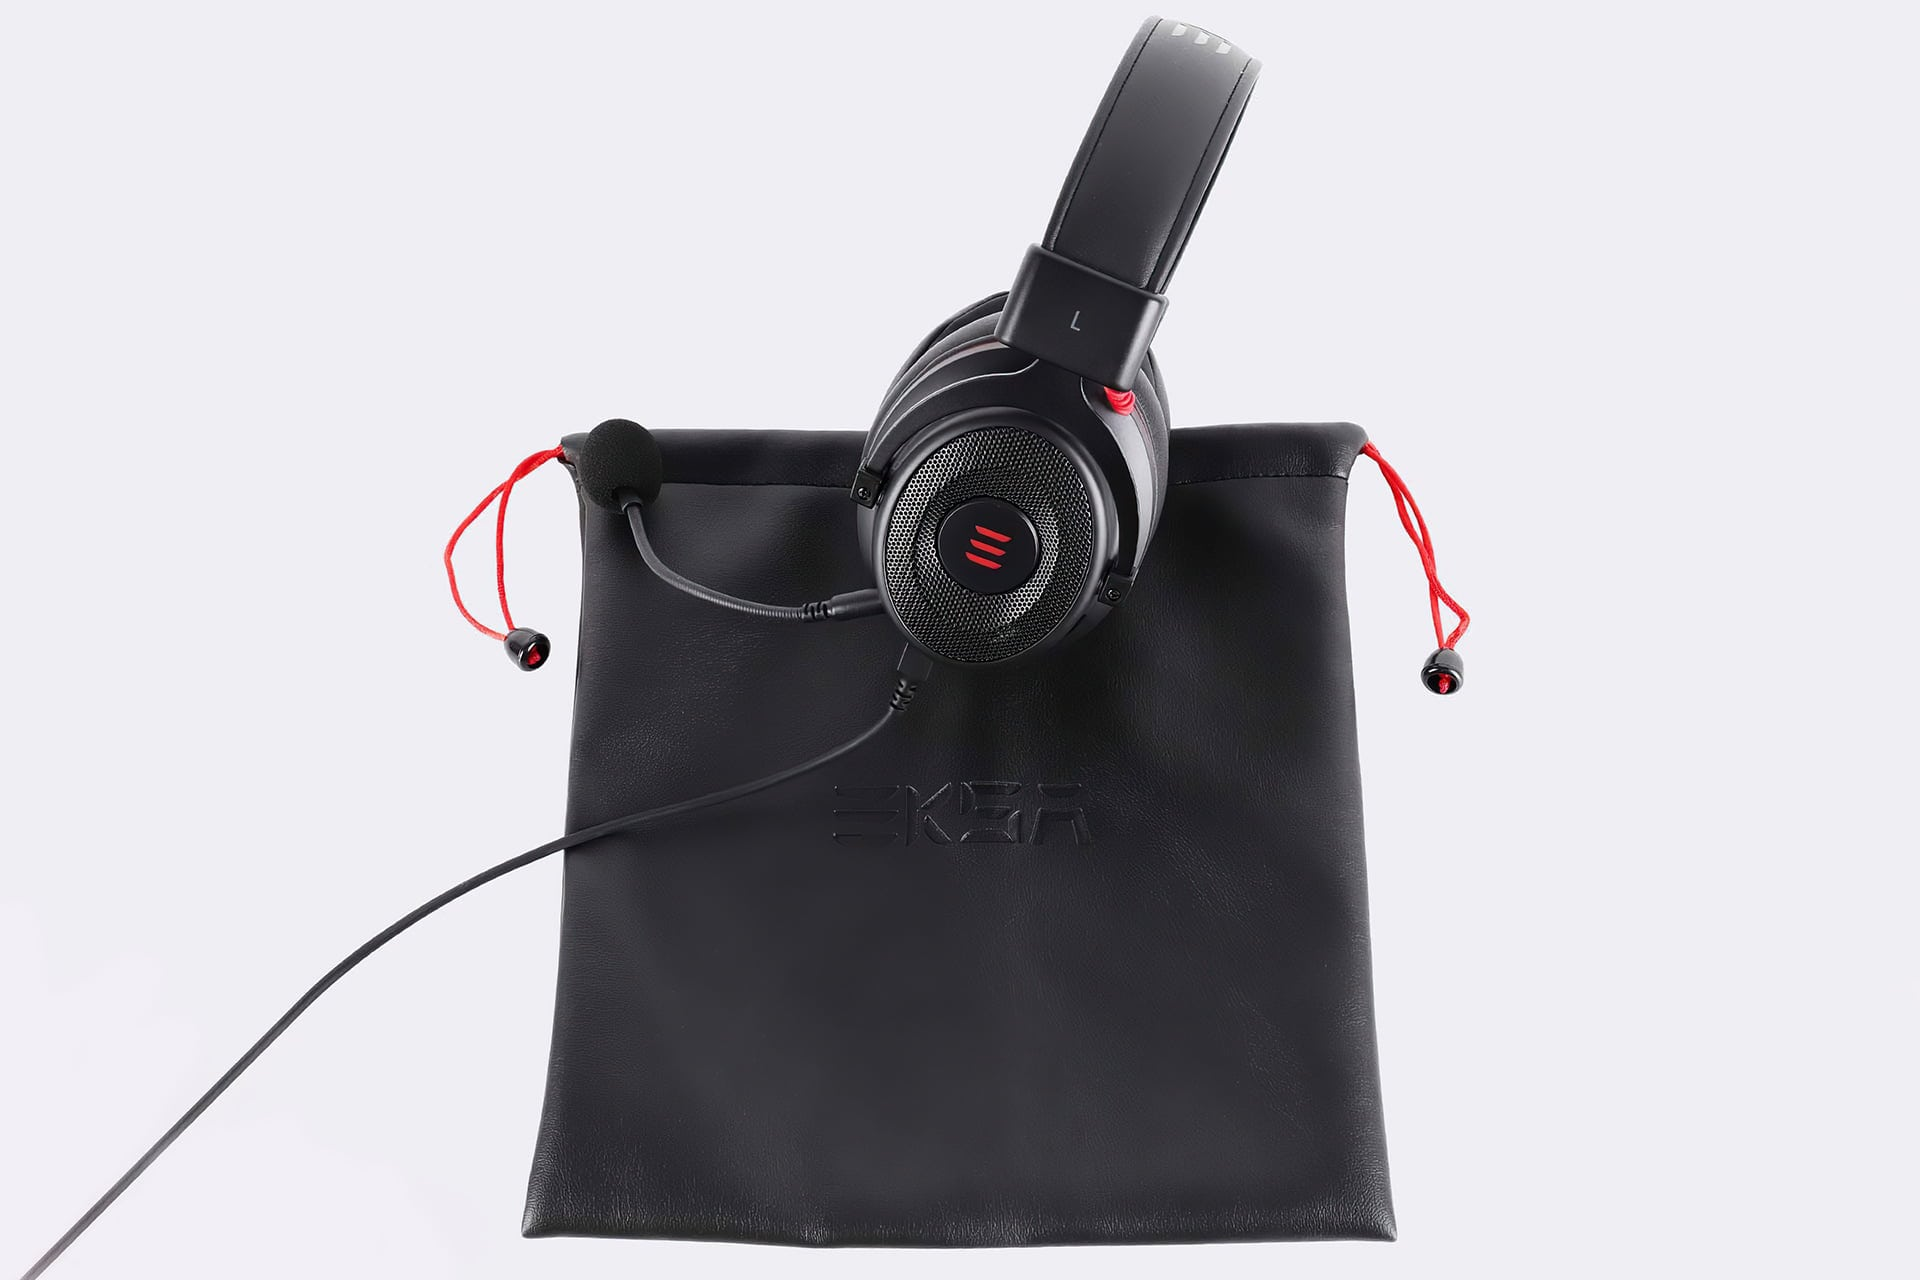 EKSA E900 Pro Headset - Equipment